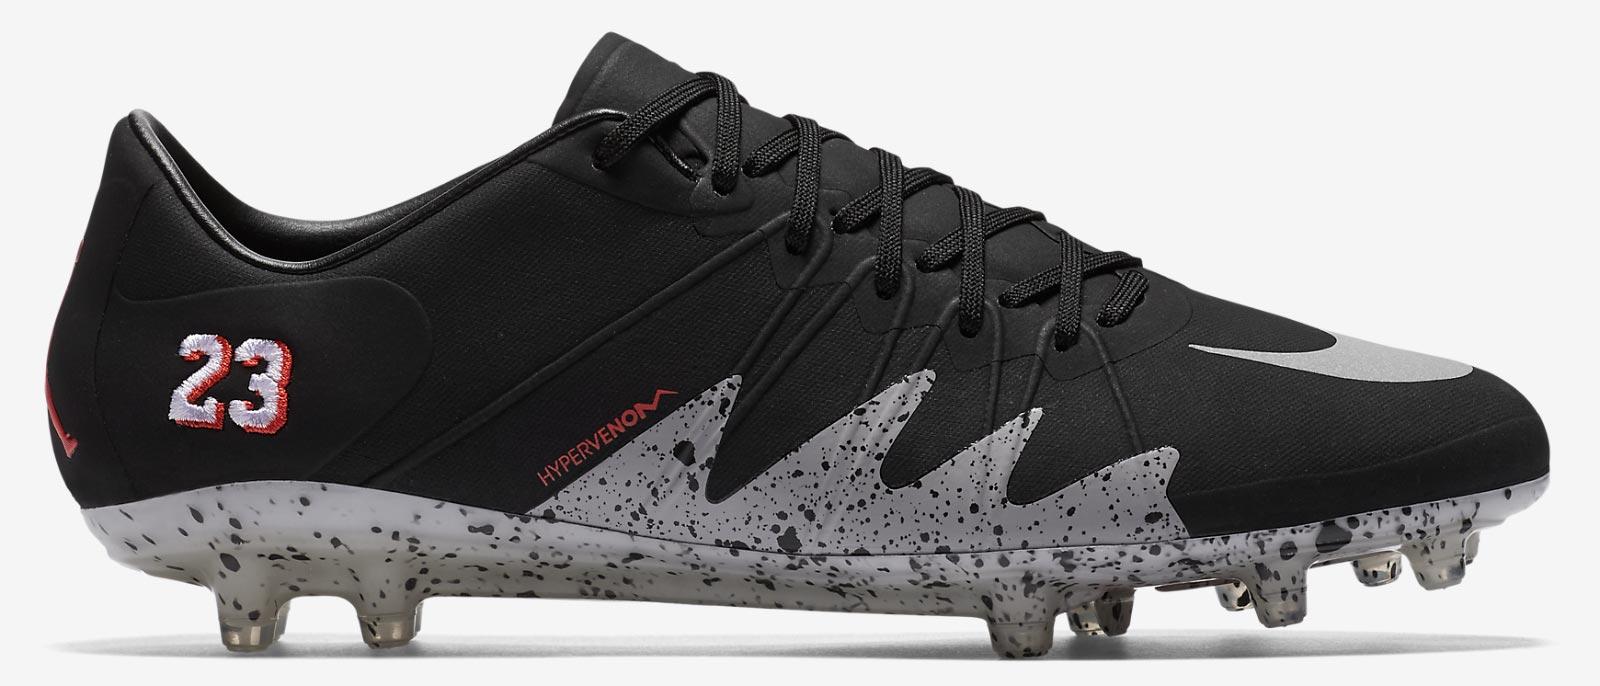 Nike Hypervenom Phinish Neymar X Jordan Boots Revealed